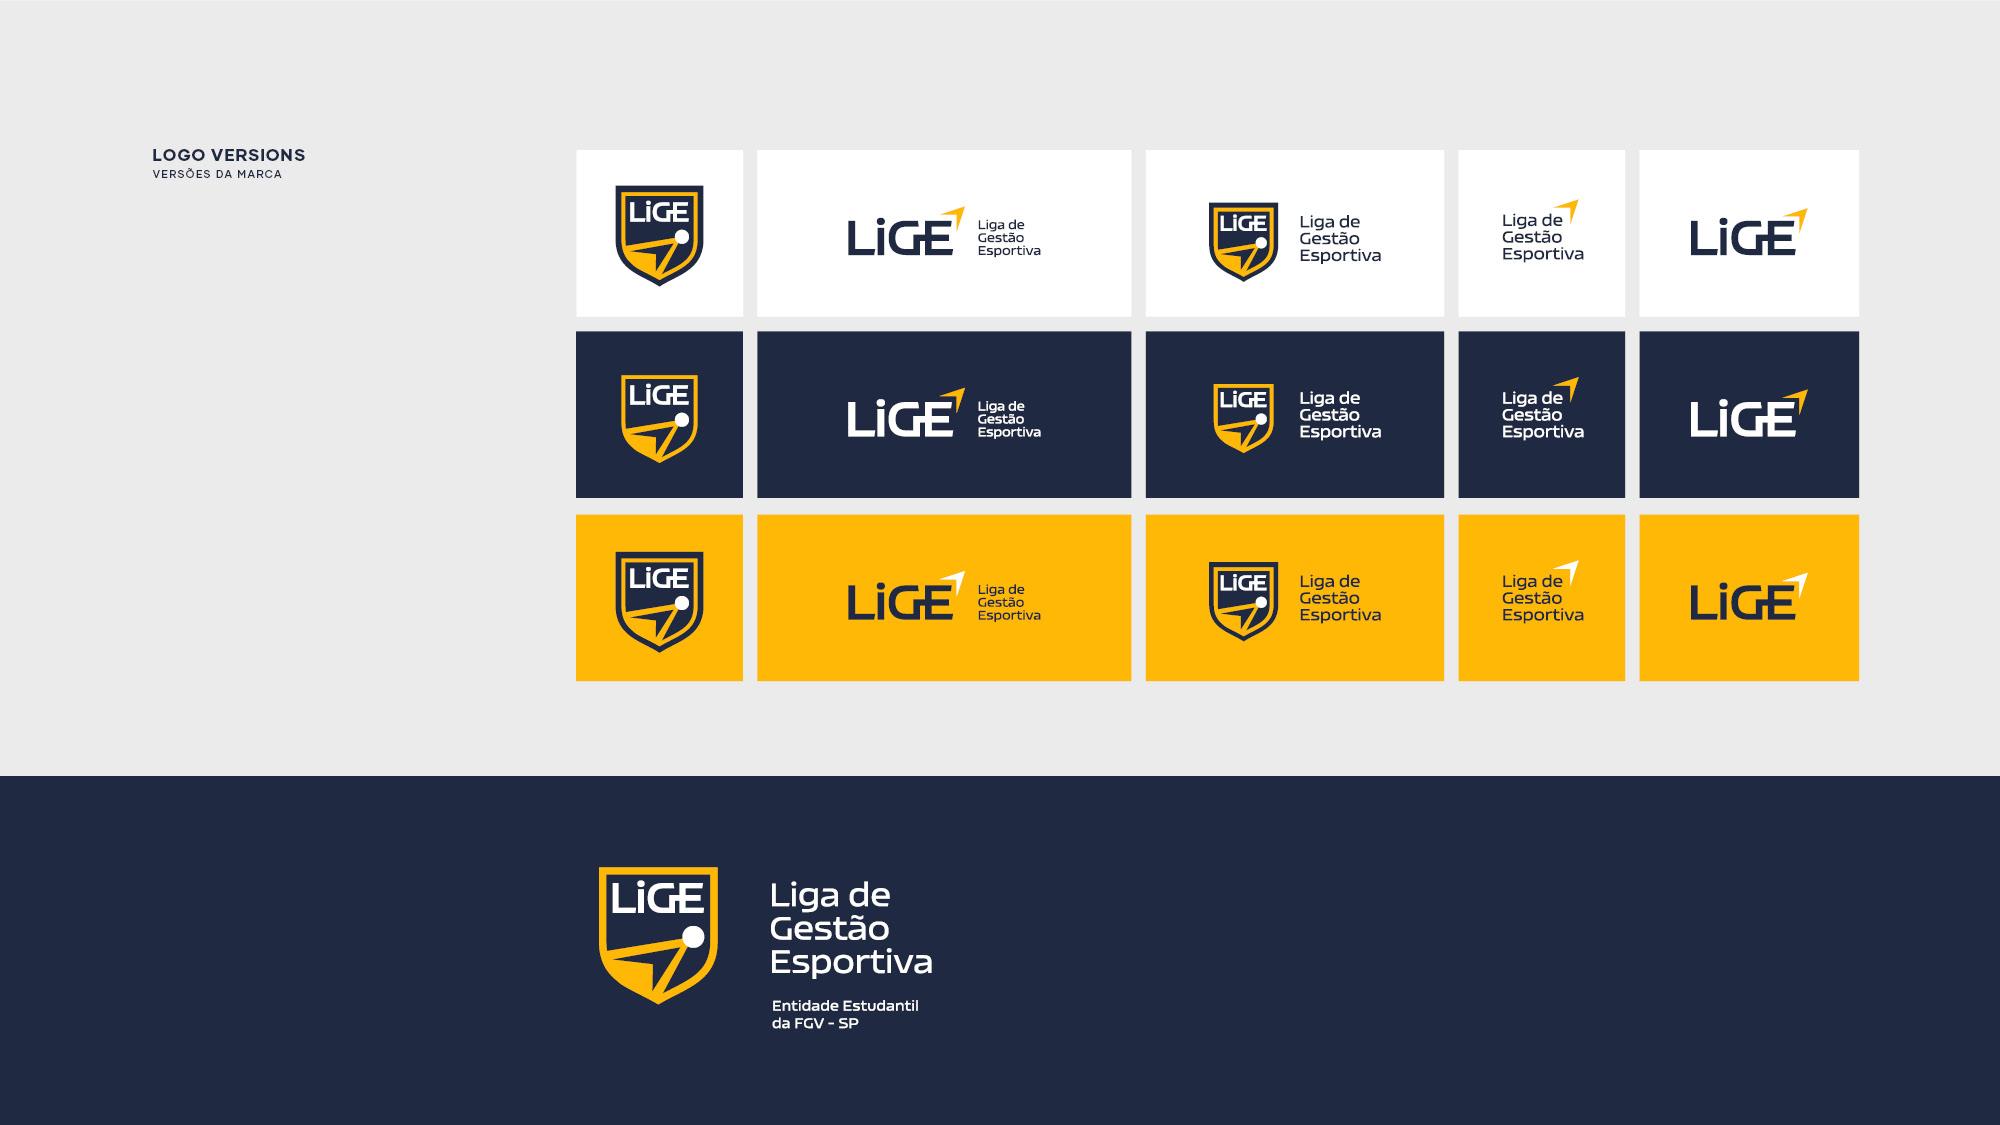 Lige-FGV-SP-Nacione-Branding7